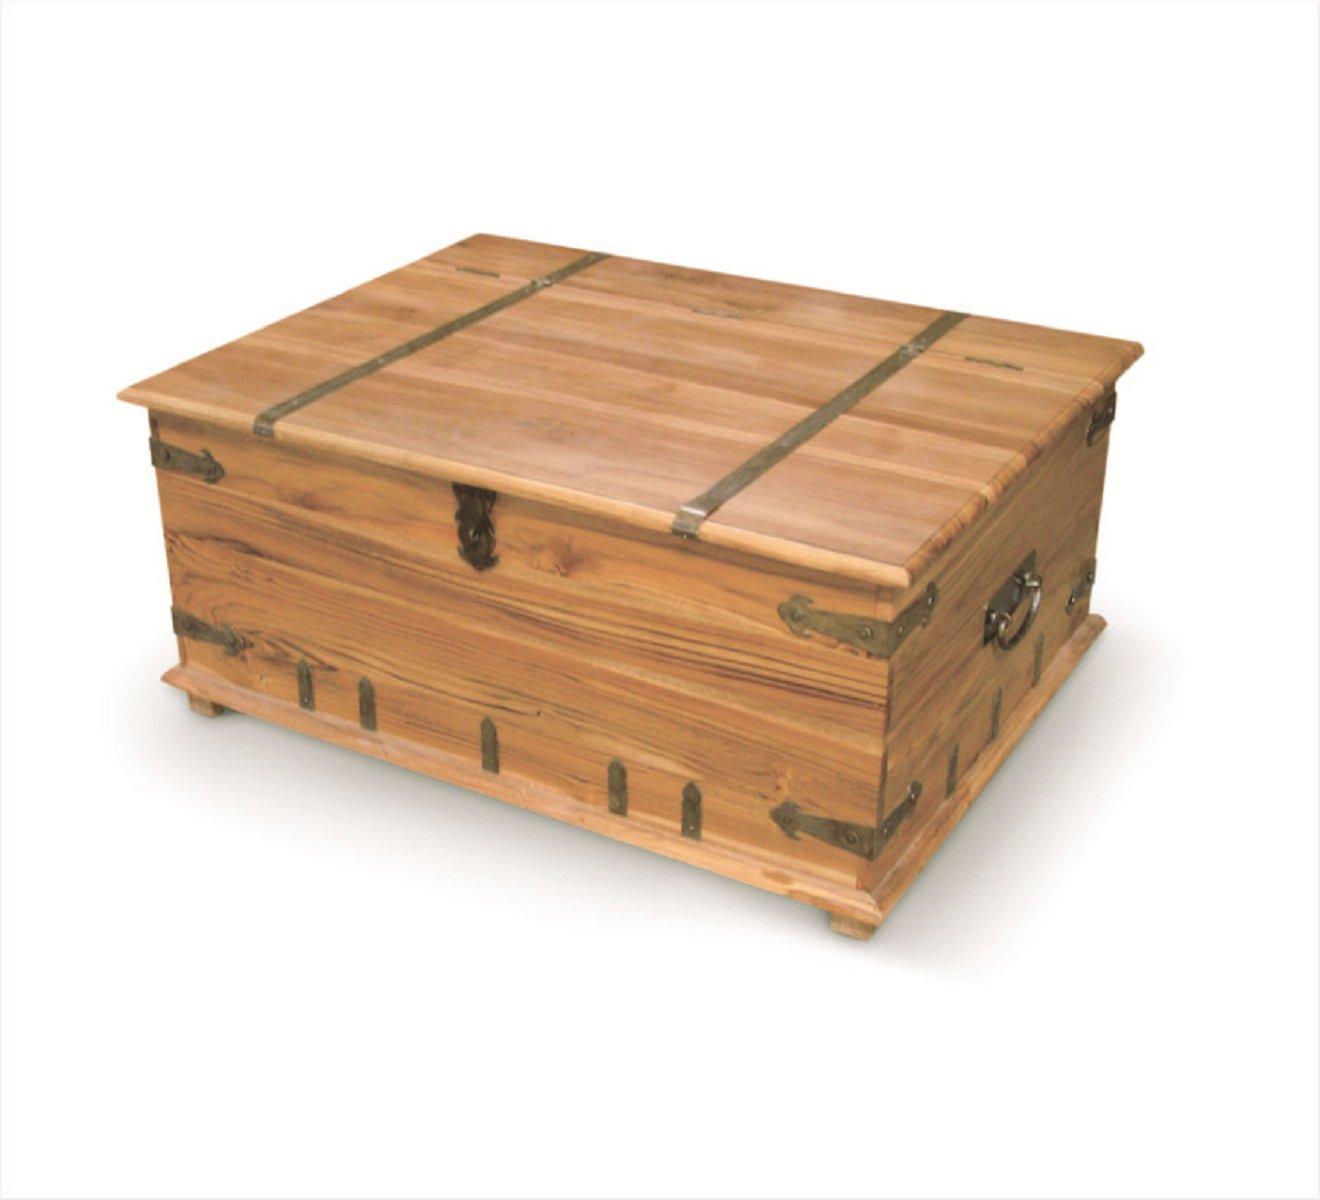 NES Furniture Nes Fine Handcrafted Furniture Solid Teak Wood Joseph Storage Trunk - 32'', Natural